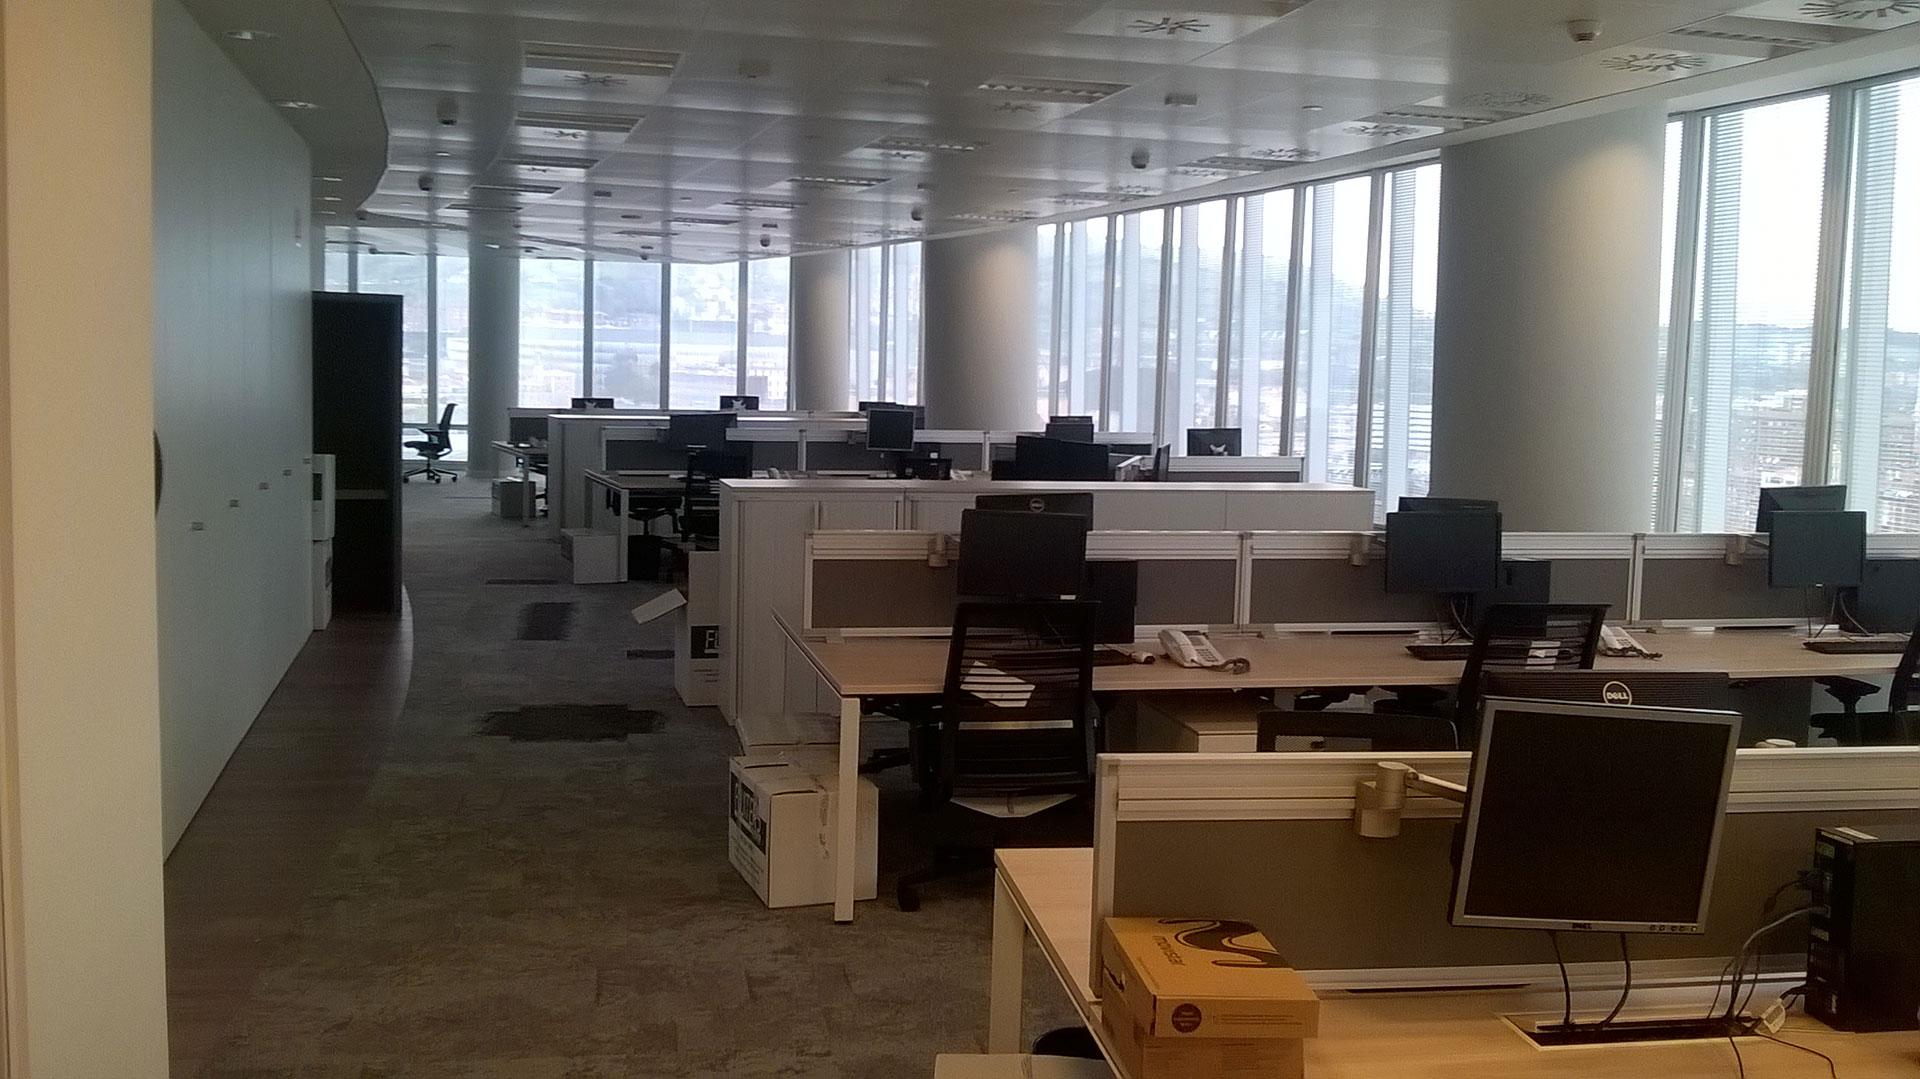 Willis Torre Iberdrola Bilbao Oficinas Construcci N